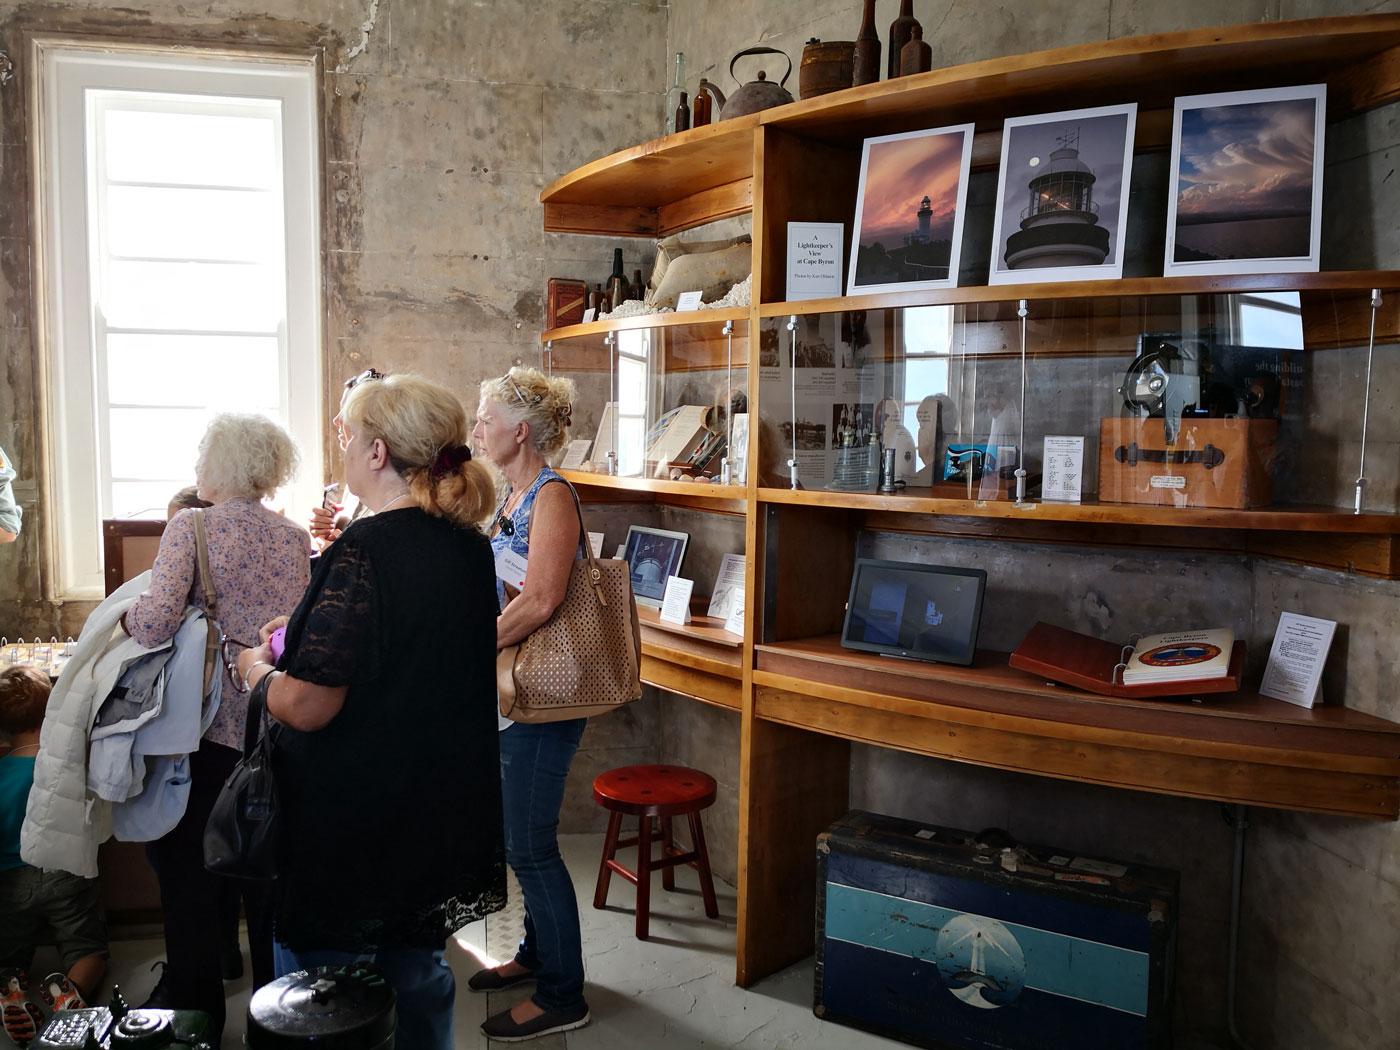 Artefact display & bookshelf